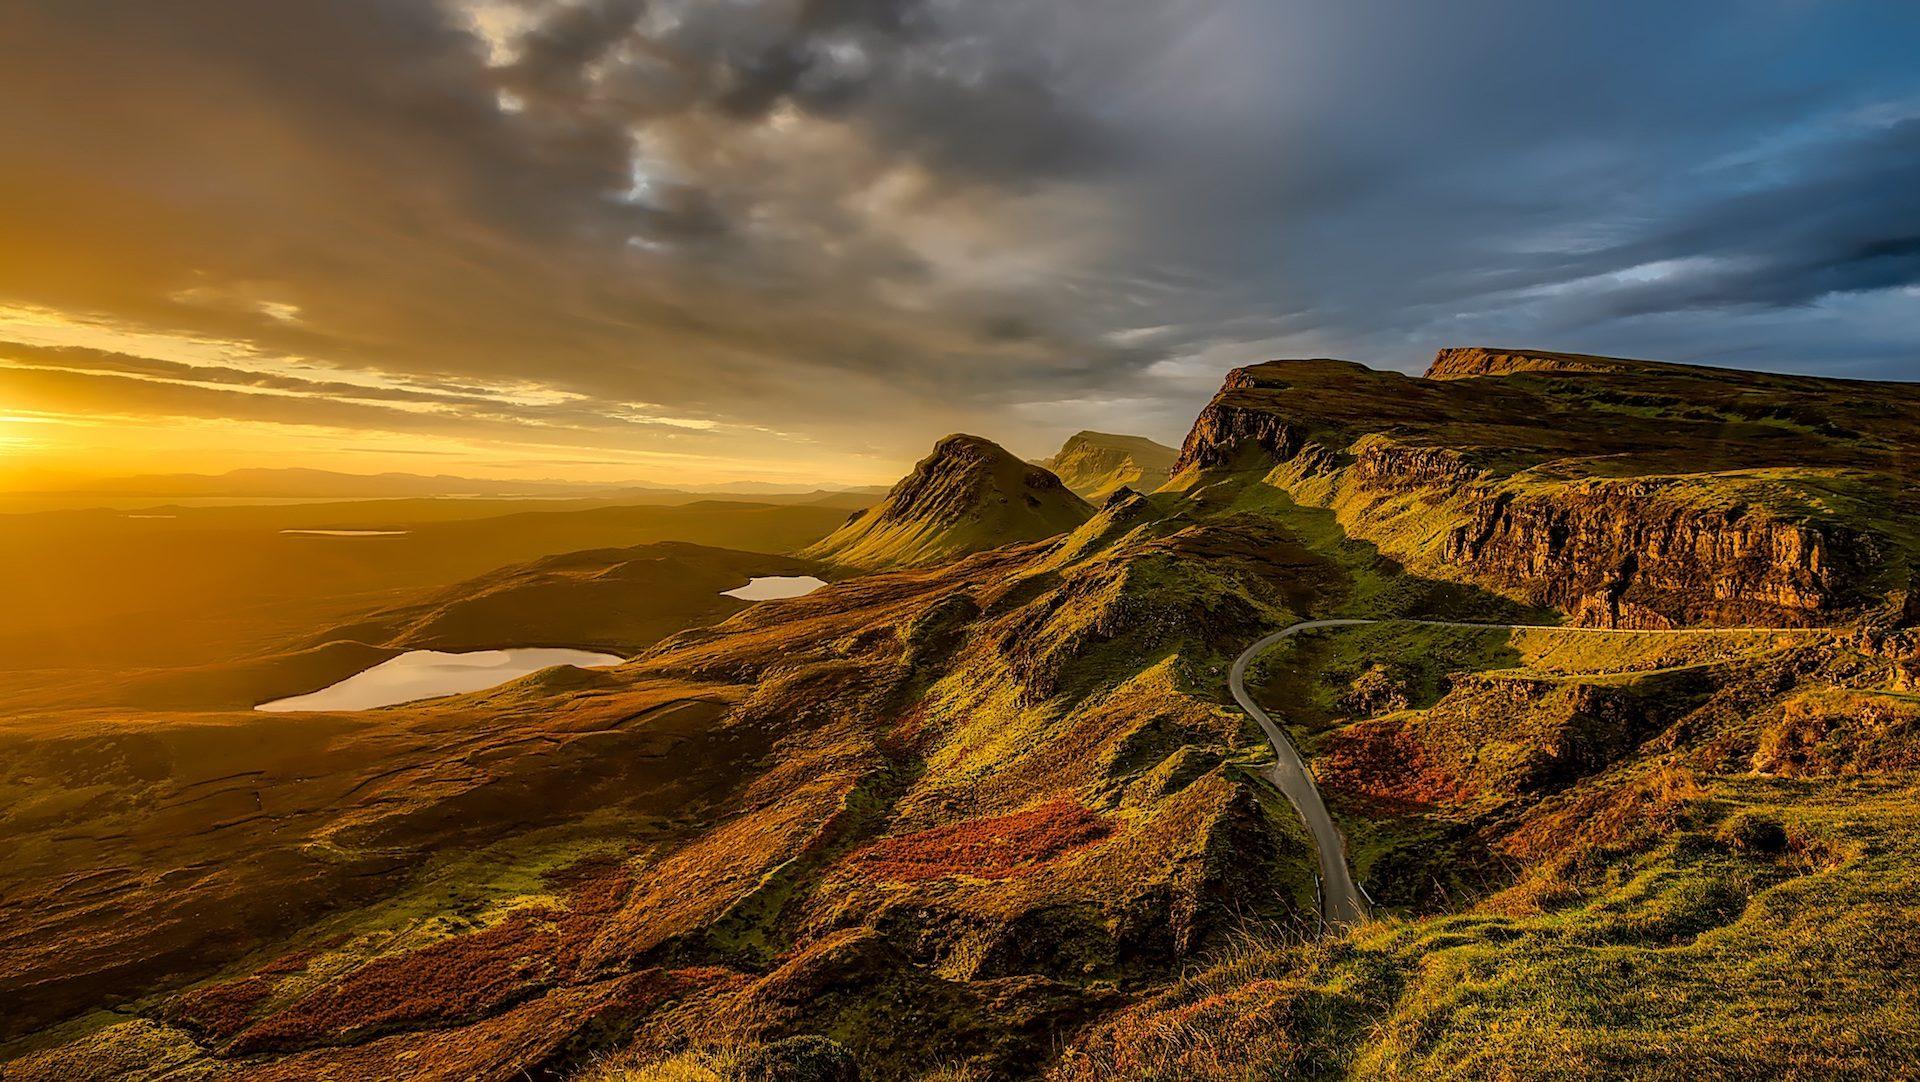 montañas, colinas, cielo, carretera, nubes, escocia - Fondos de Pantalla HD - professor-falken.com